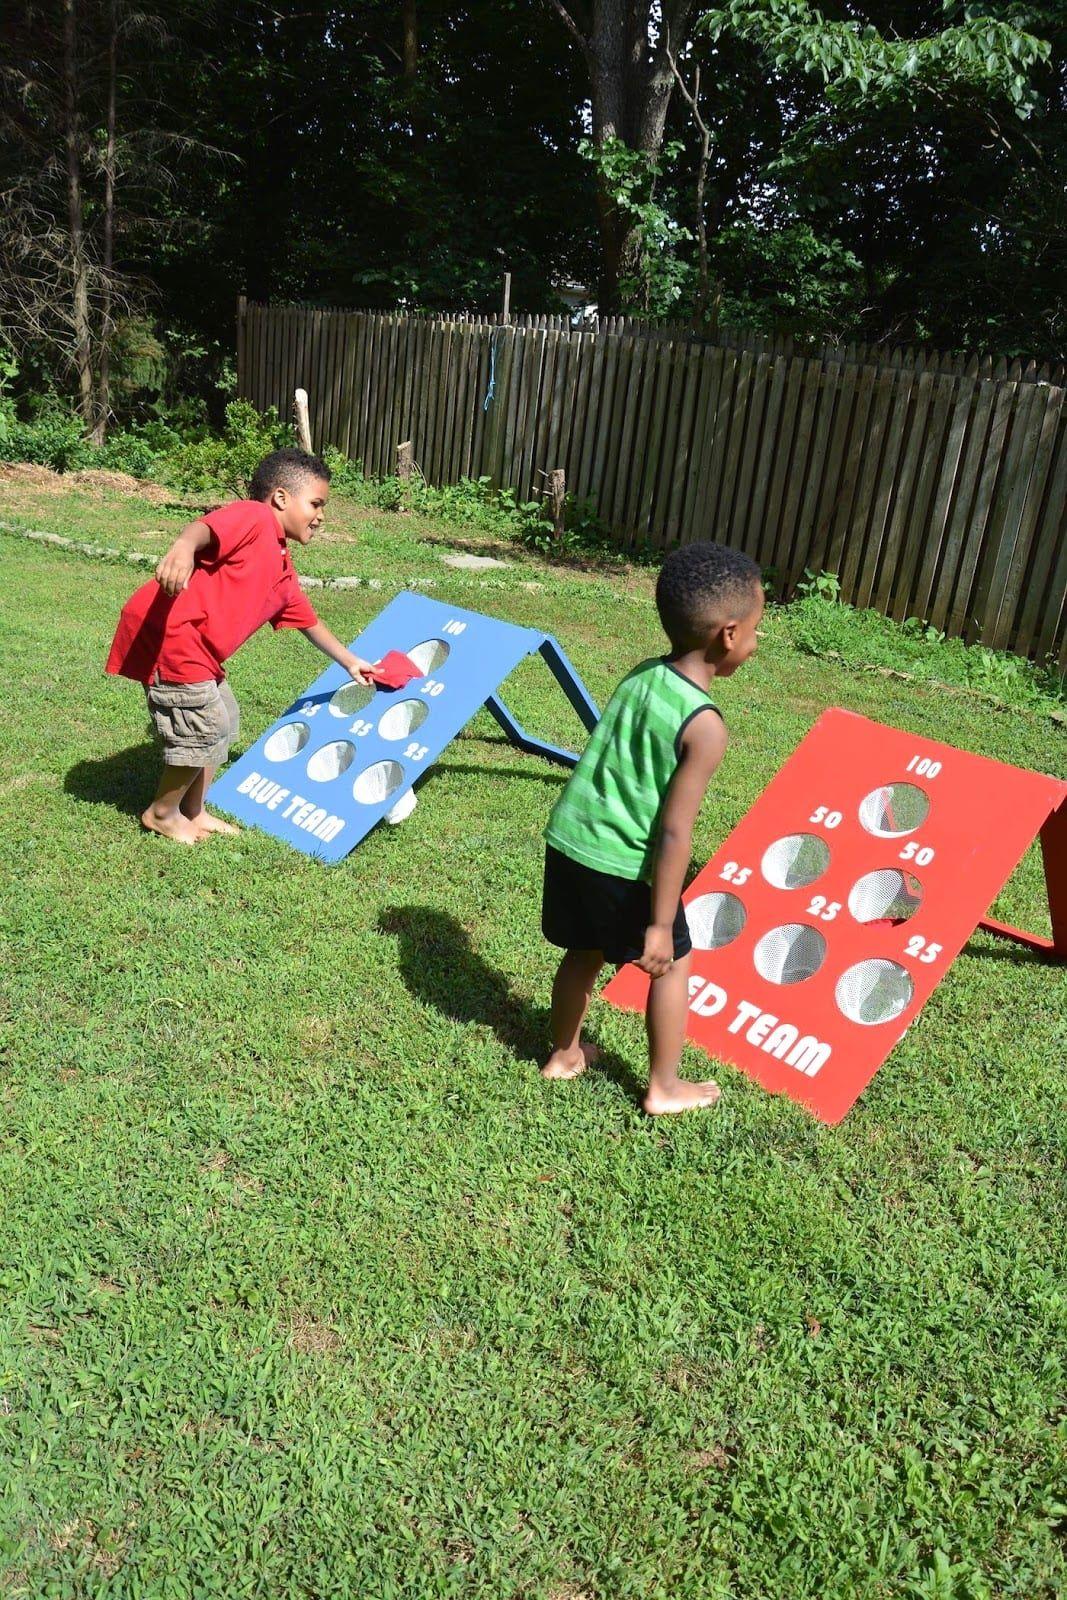 Incredible How To Make A Diy Backyard Bean Bag Toss Game Kids Bean Evergreenethics Interior Chair Design Evergreenethicsorg